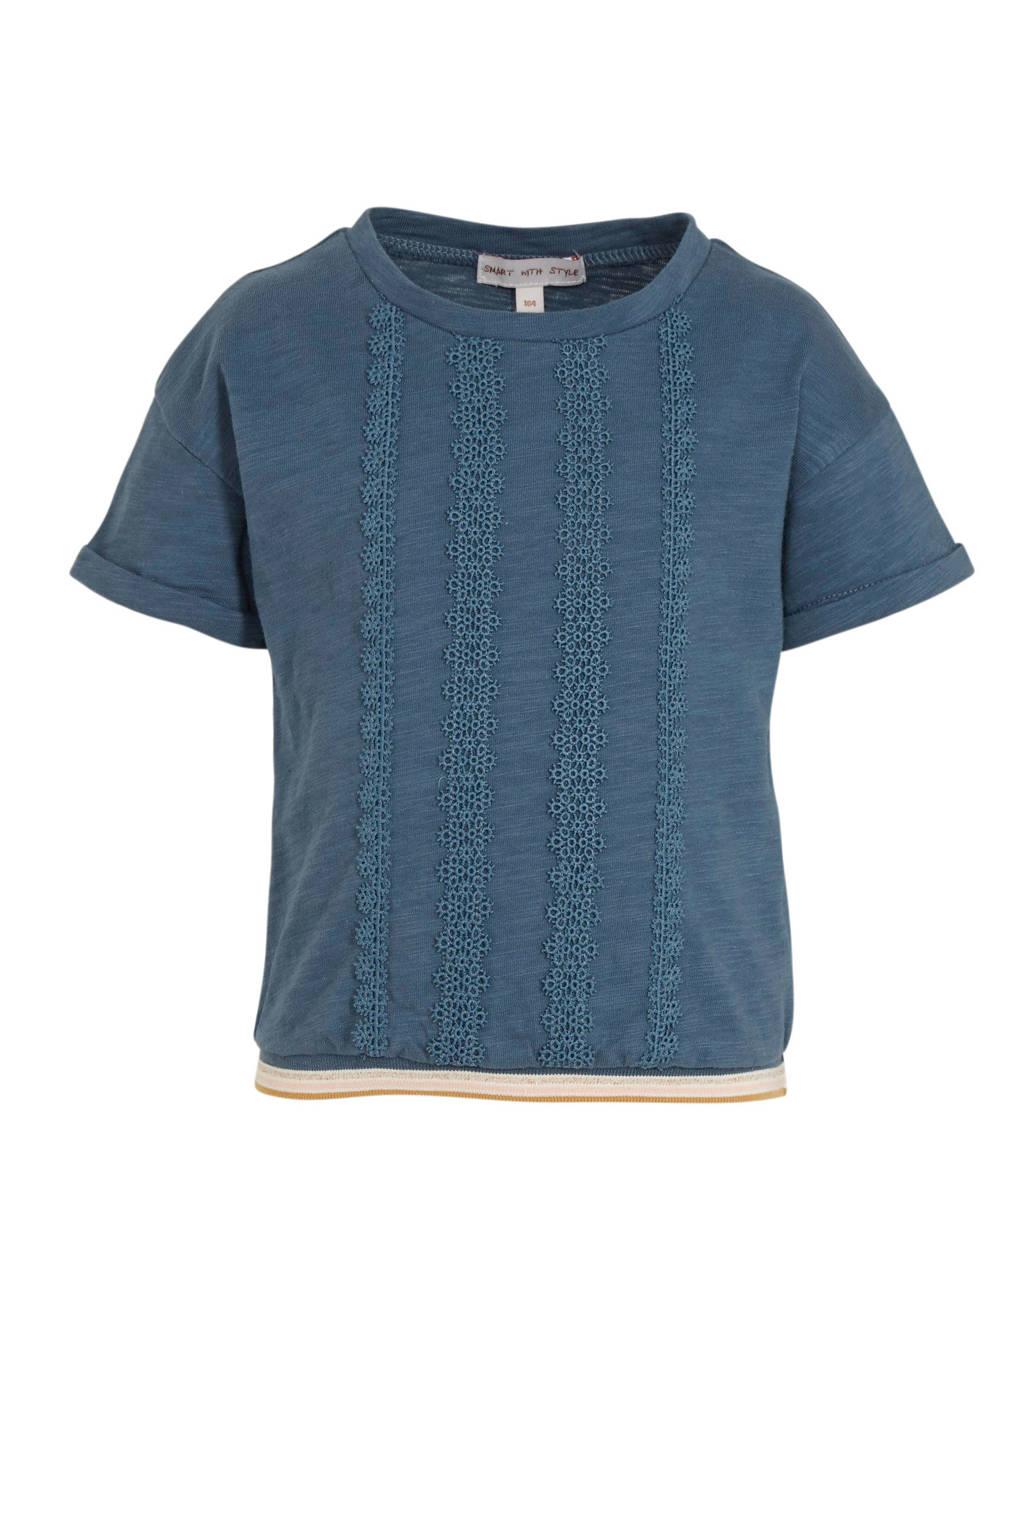 C&A gemêleerde top met contrastbies en kant blauw/ecru, Blauw/ecru